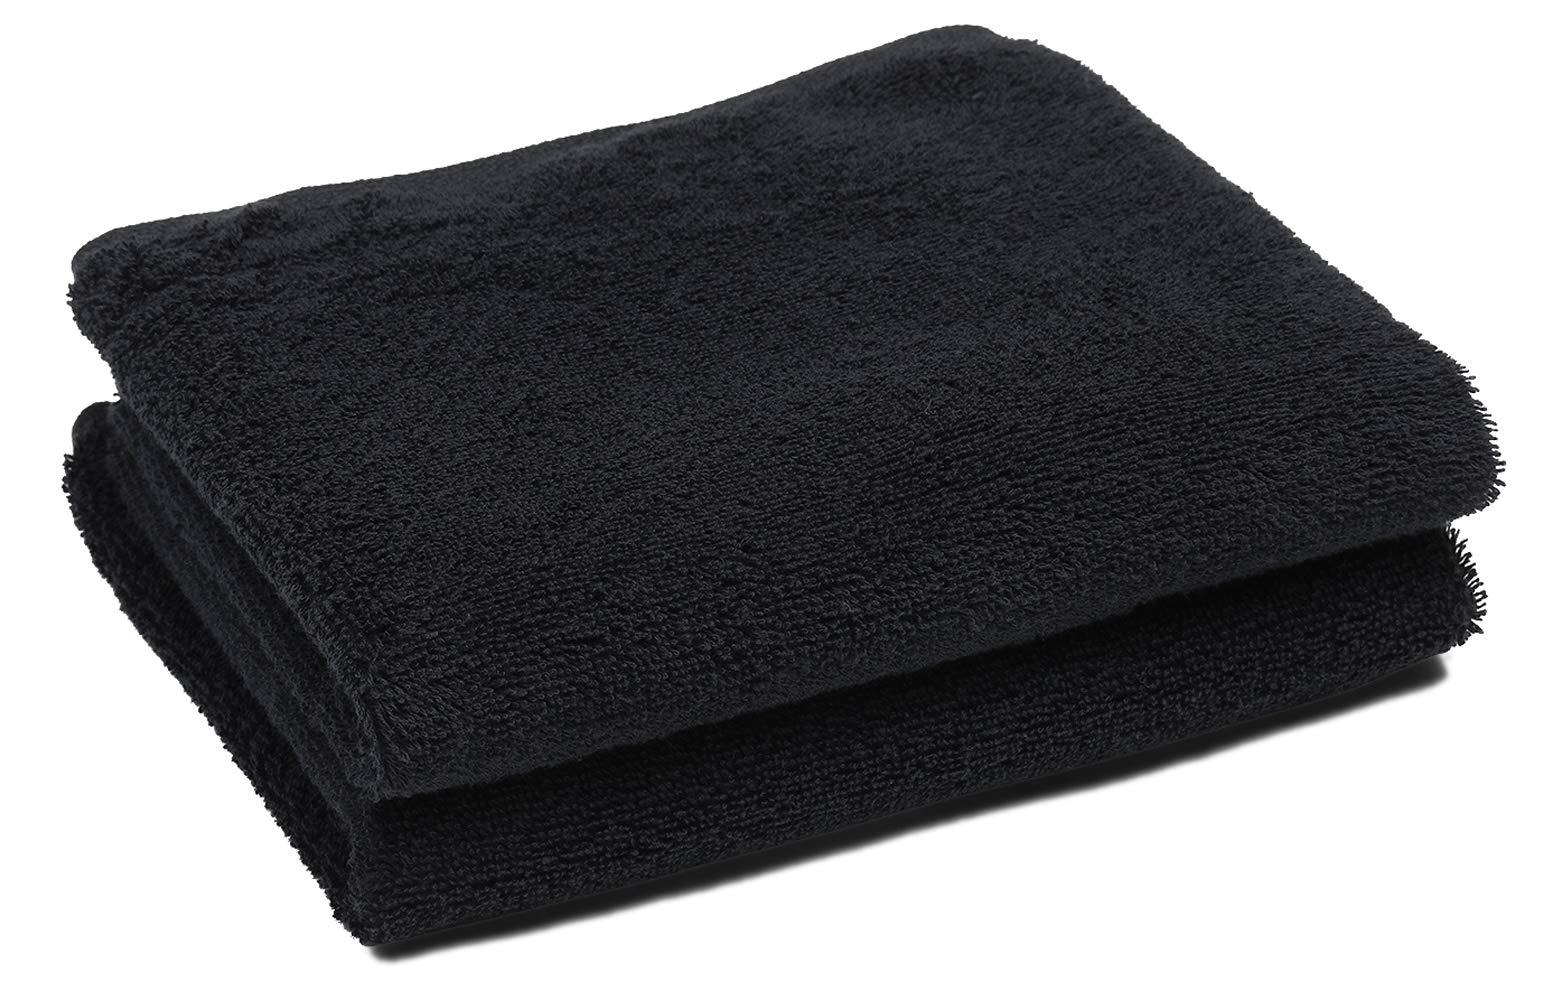 PERFEHAIR Black Salon Towels (2-Pack, 16 X 27 Inches)-Barber Hand Cotton Towel for Gym, Bath, Spa, Shaving, Shampoo by PERFEHAIR